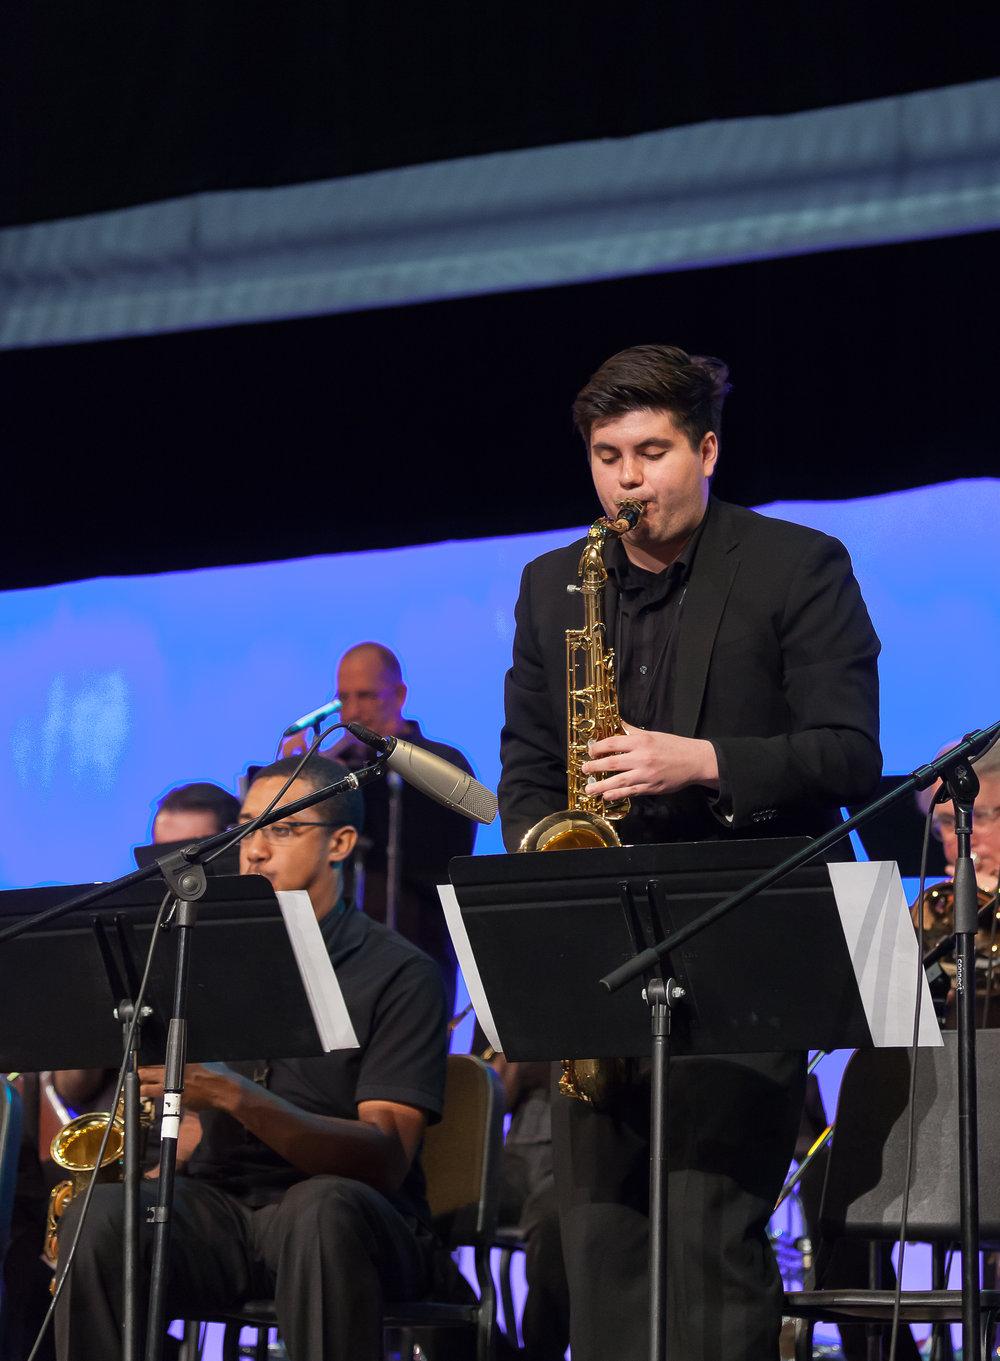 Kyle Jiminez, tenor sax